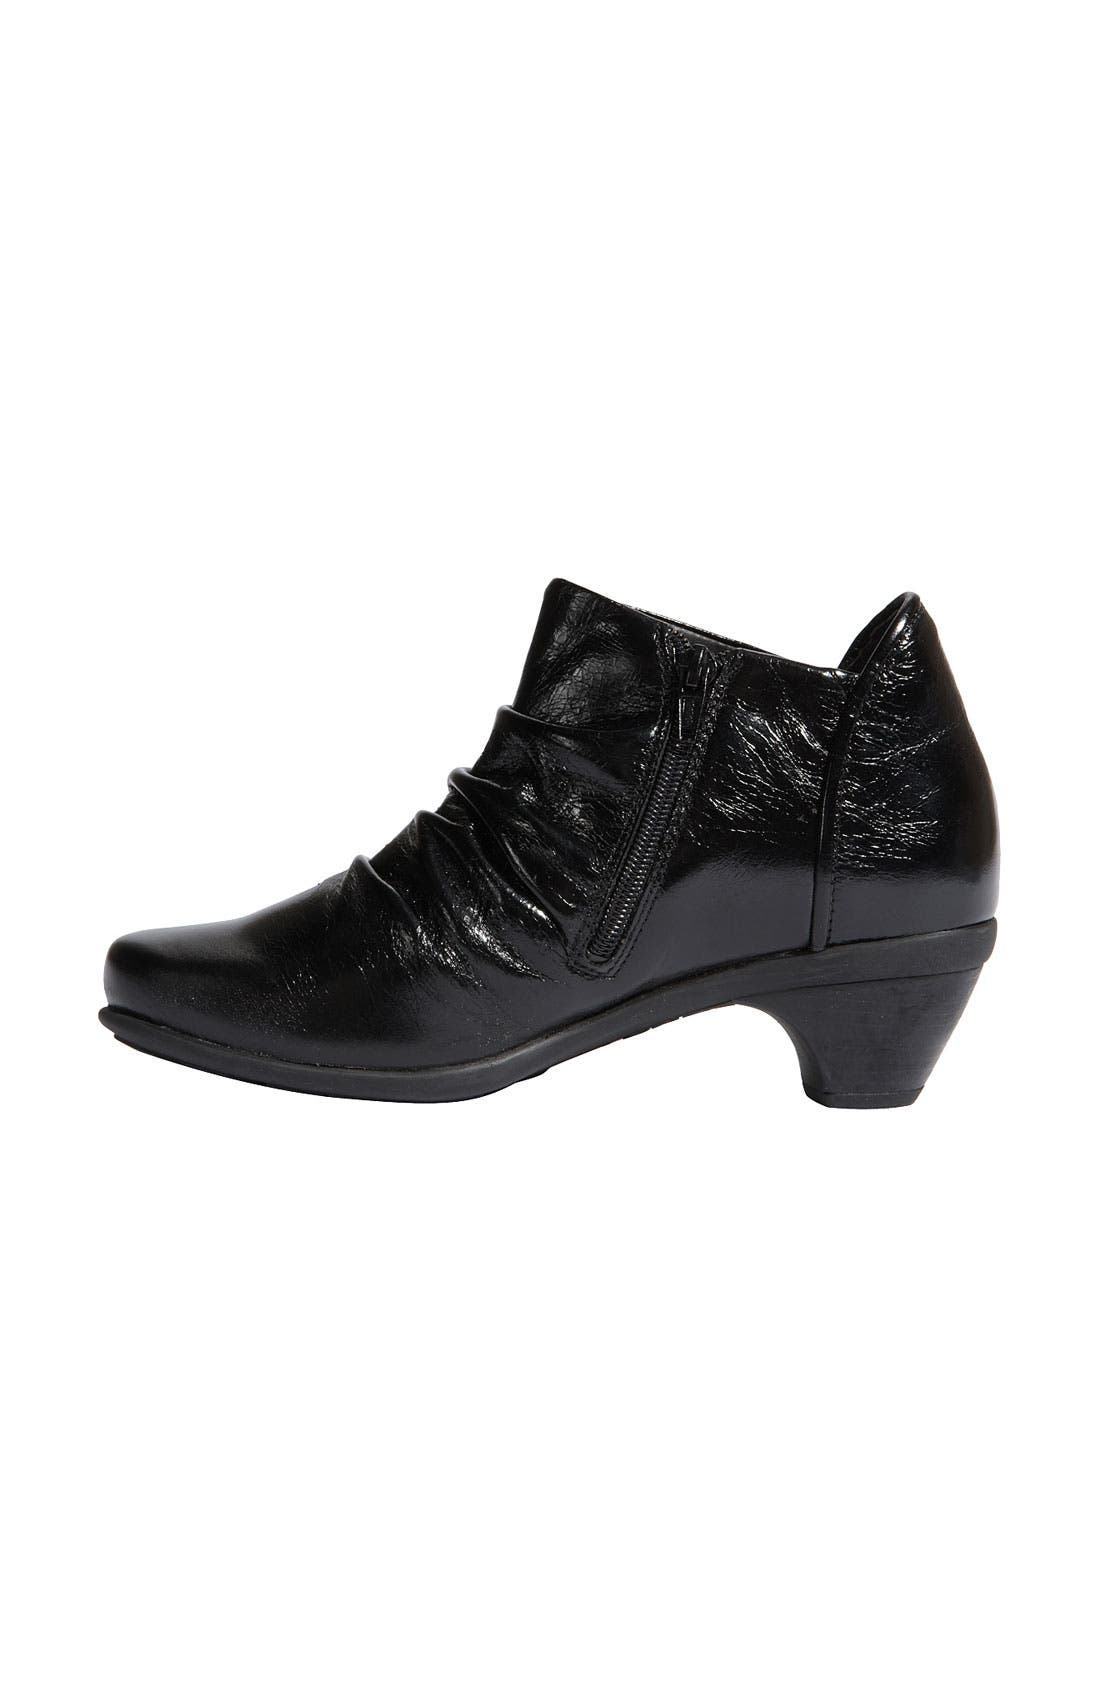 'Advance' Ankle Boot,                             Alternate thumbnail 3, color,                             001